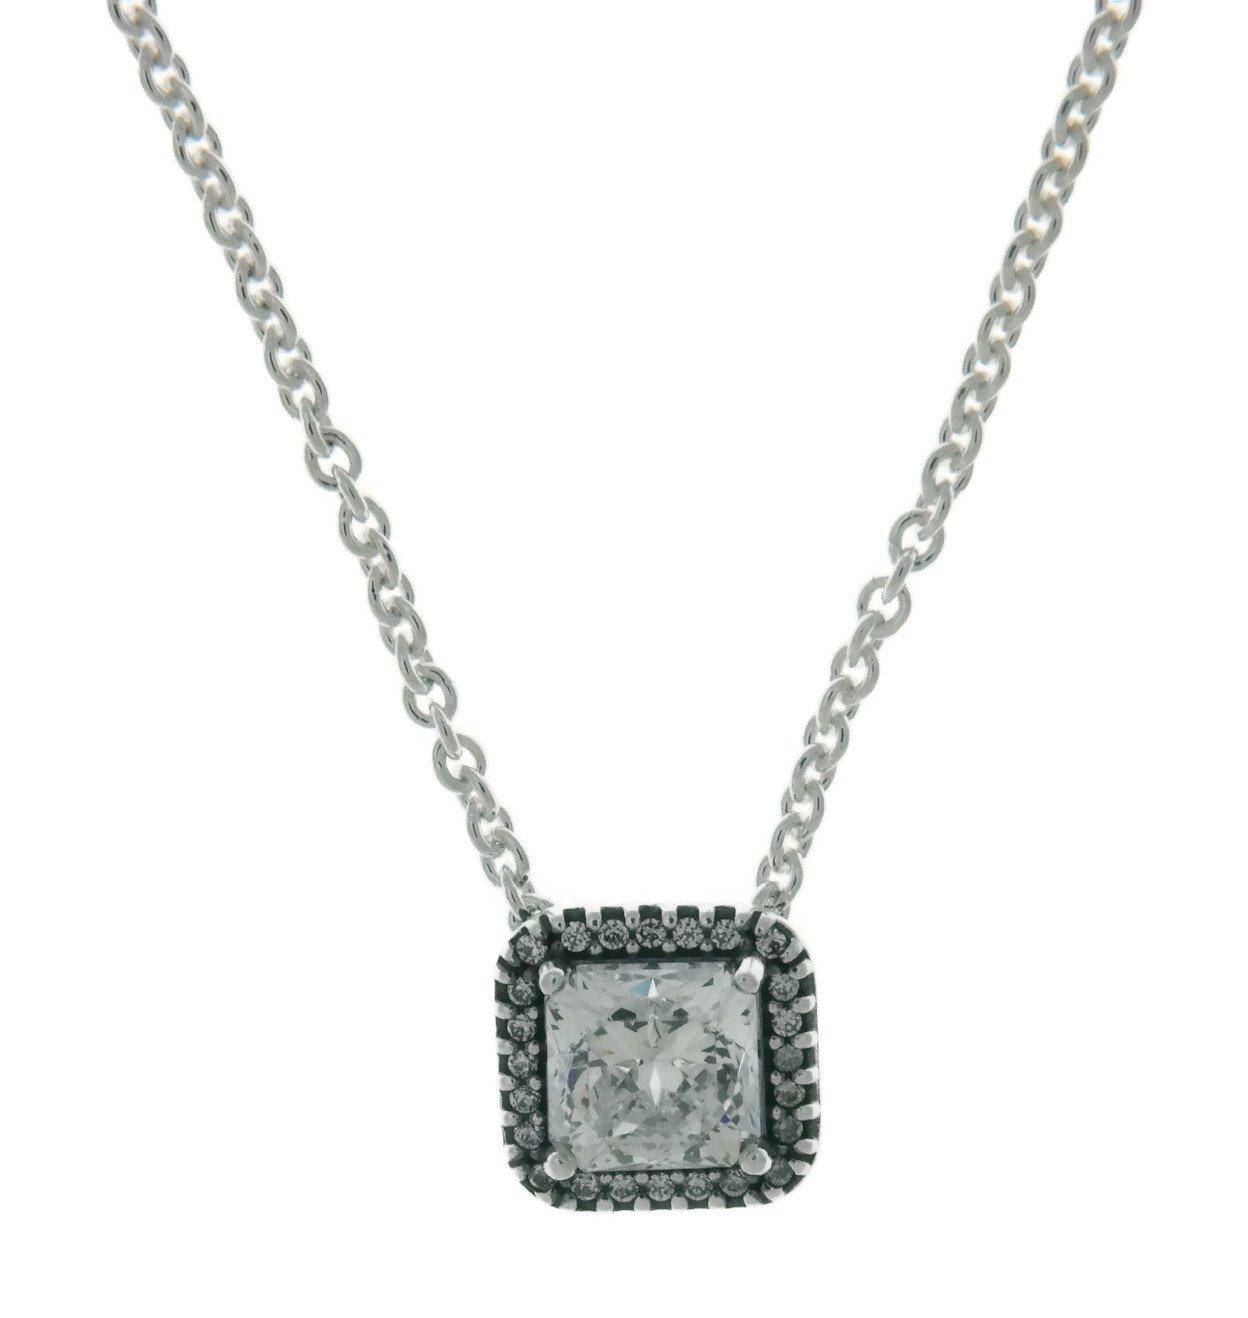 Pandora Timeless Elegance Necklace, Clear CZ 396241CZ-45 Centimeters 17.7 Inches